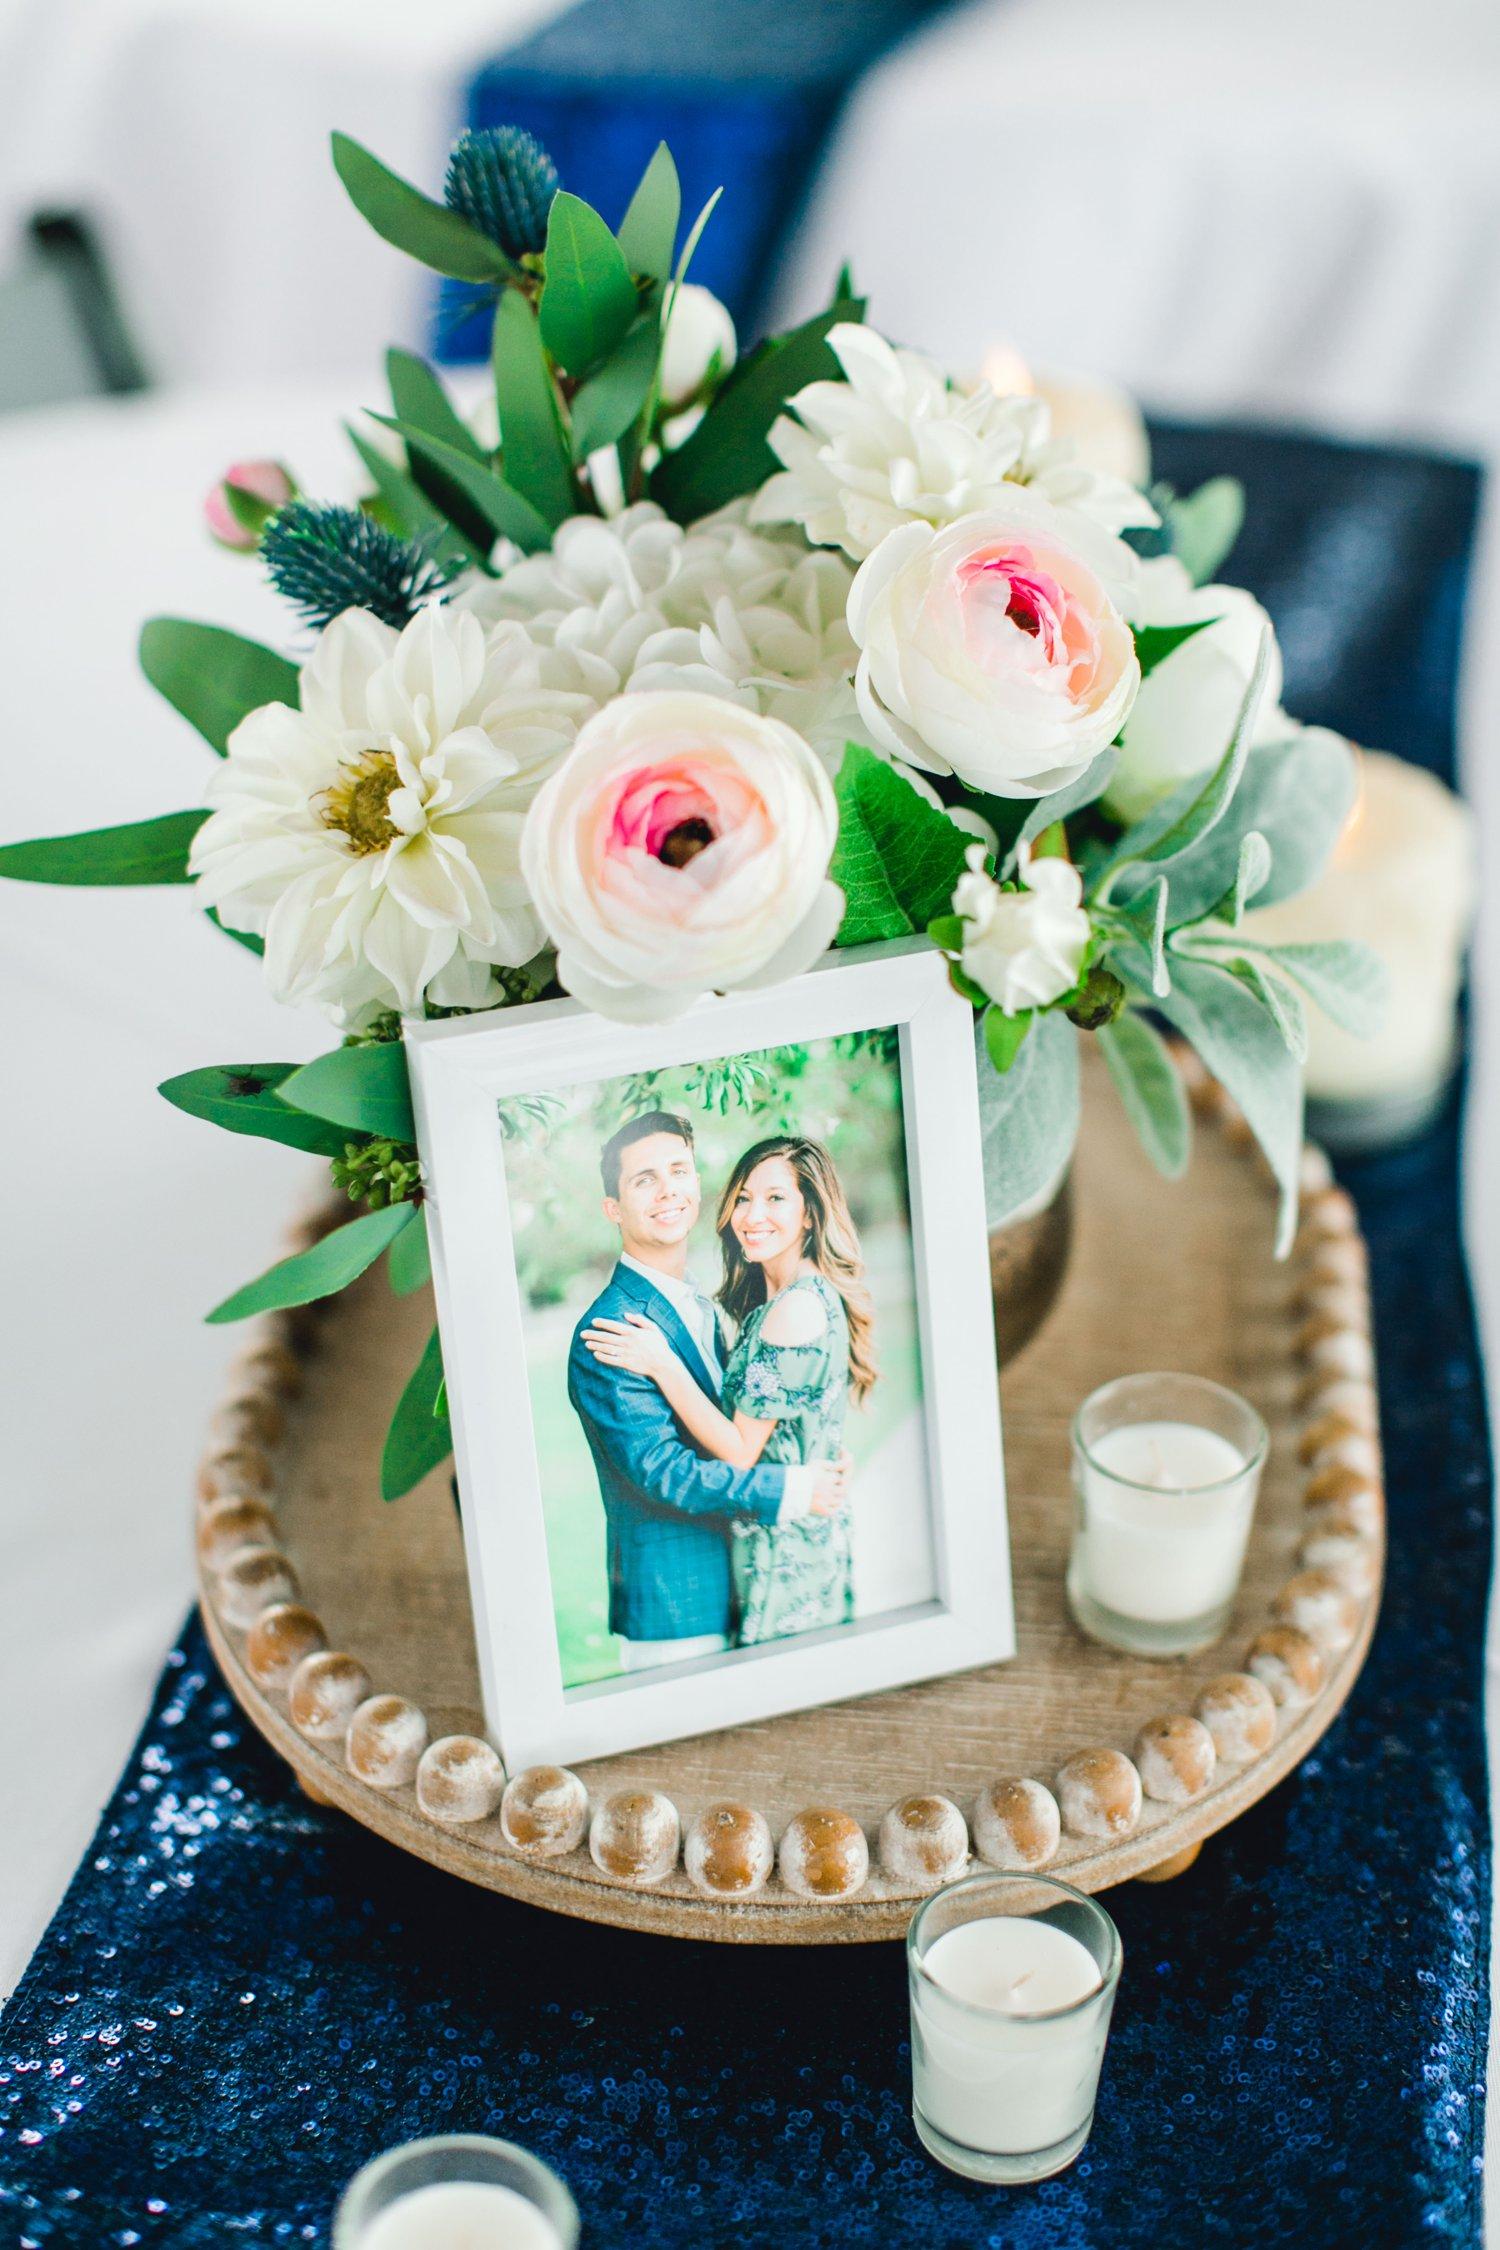 Ashley_John_English_Elegant_Texas_Wedding_Outdoors_Ranch_Caprock_Winery_ALLEEJ_0184.jpg